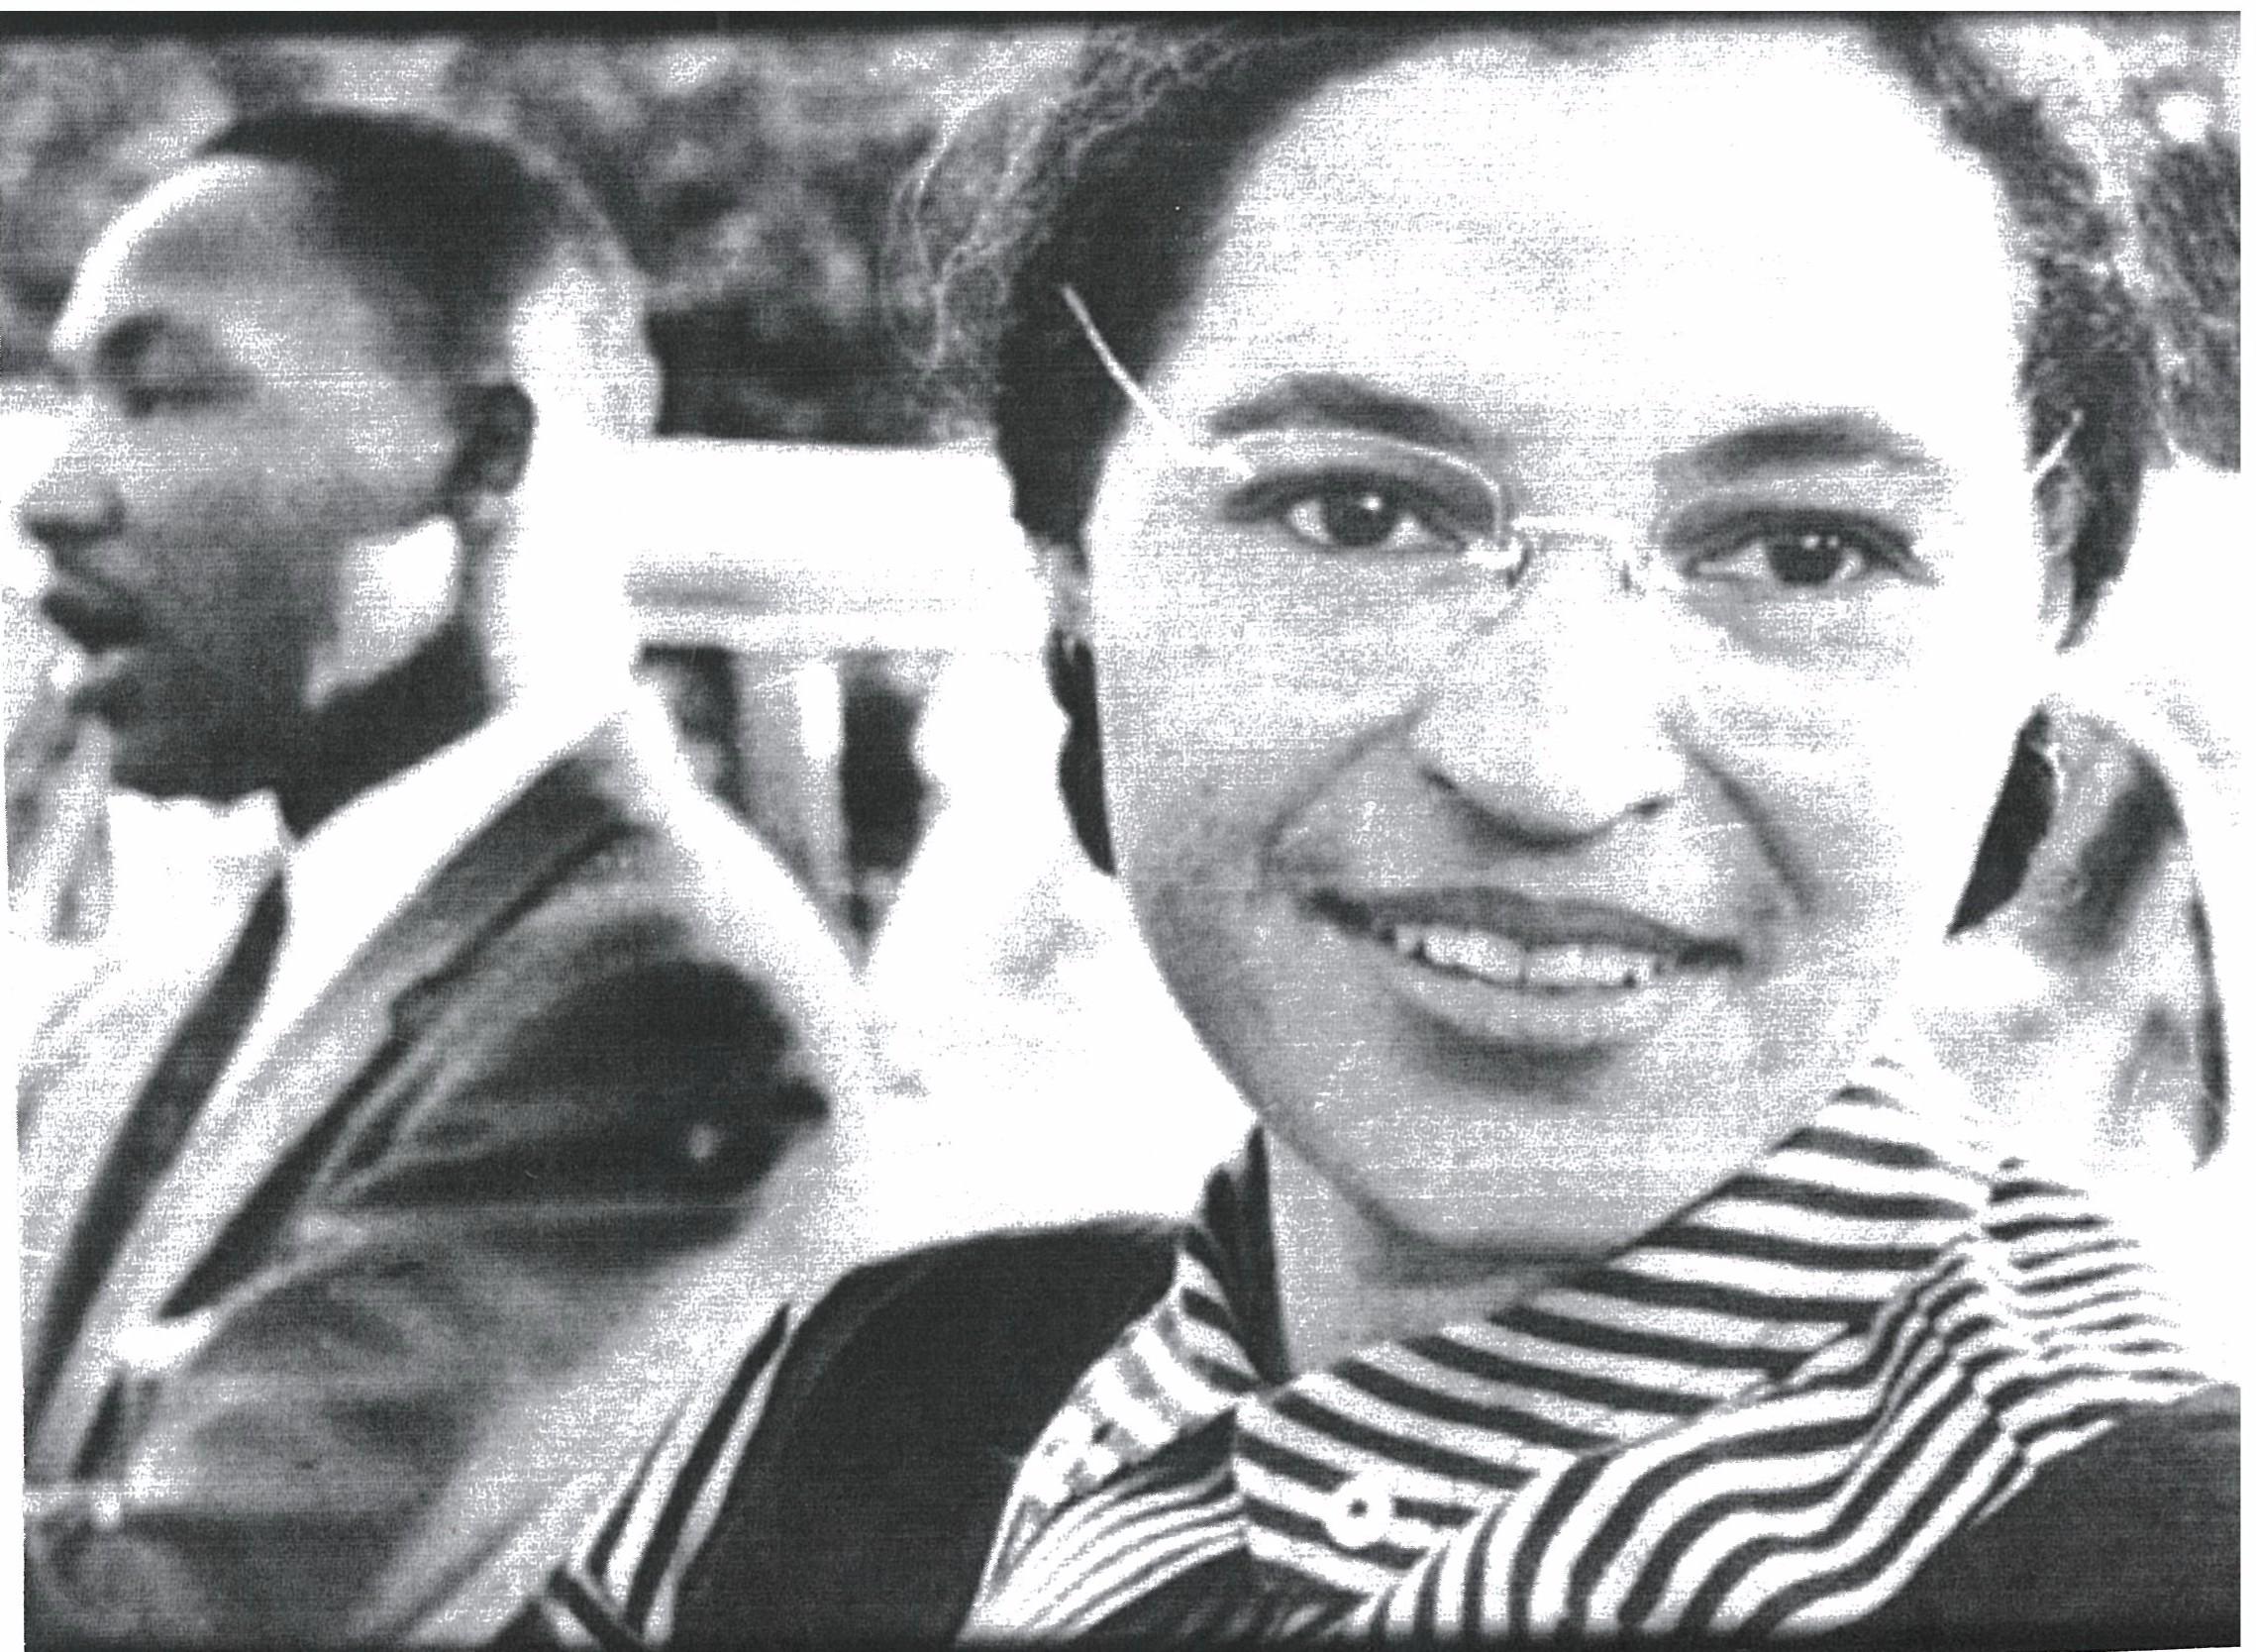 Rosa Parks Black History Month Series Profile